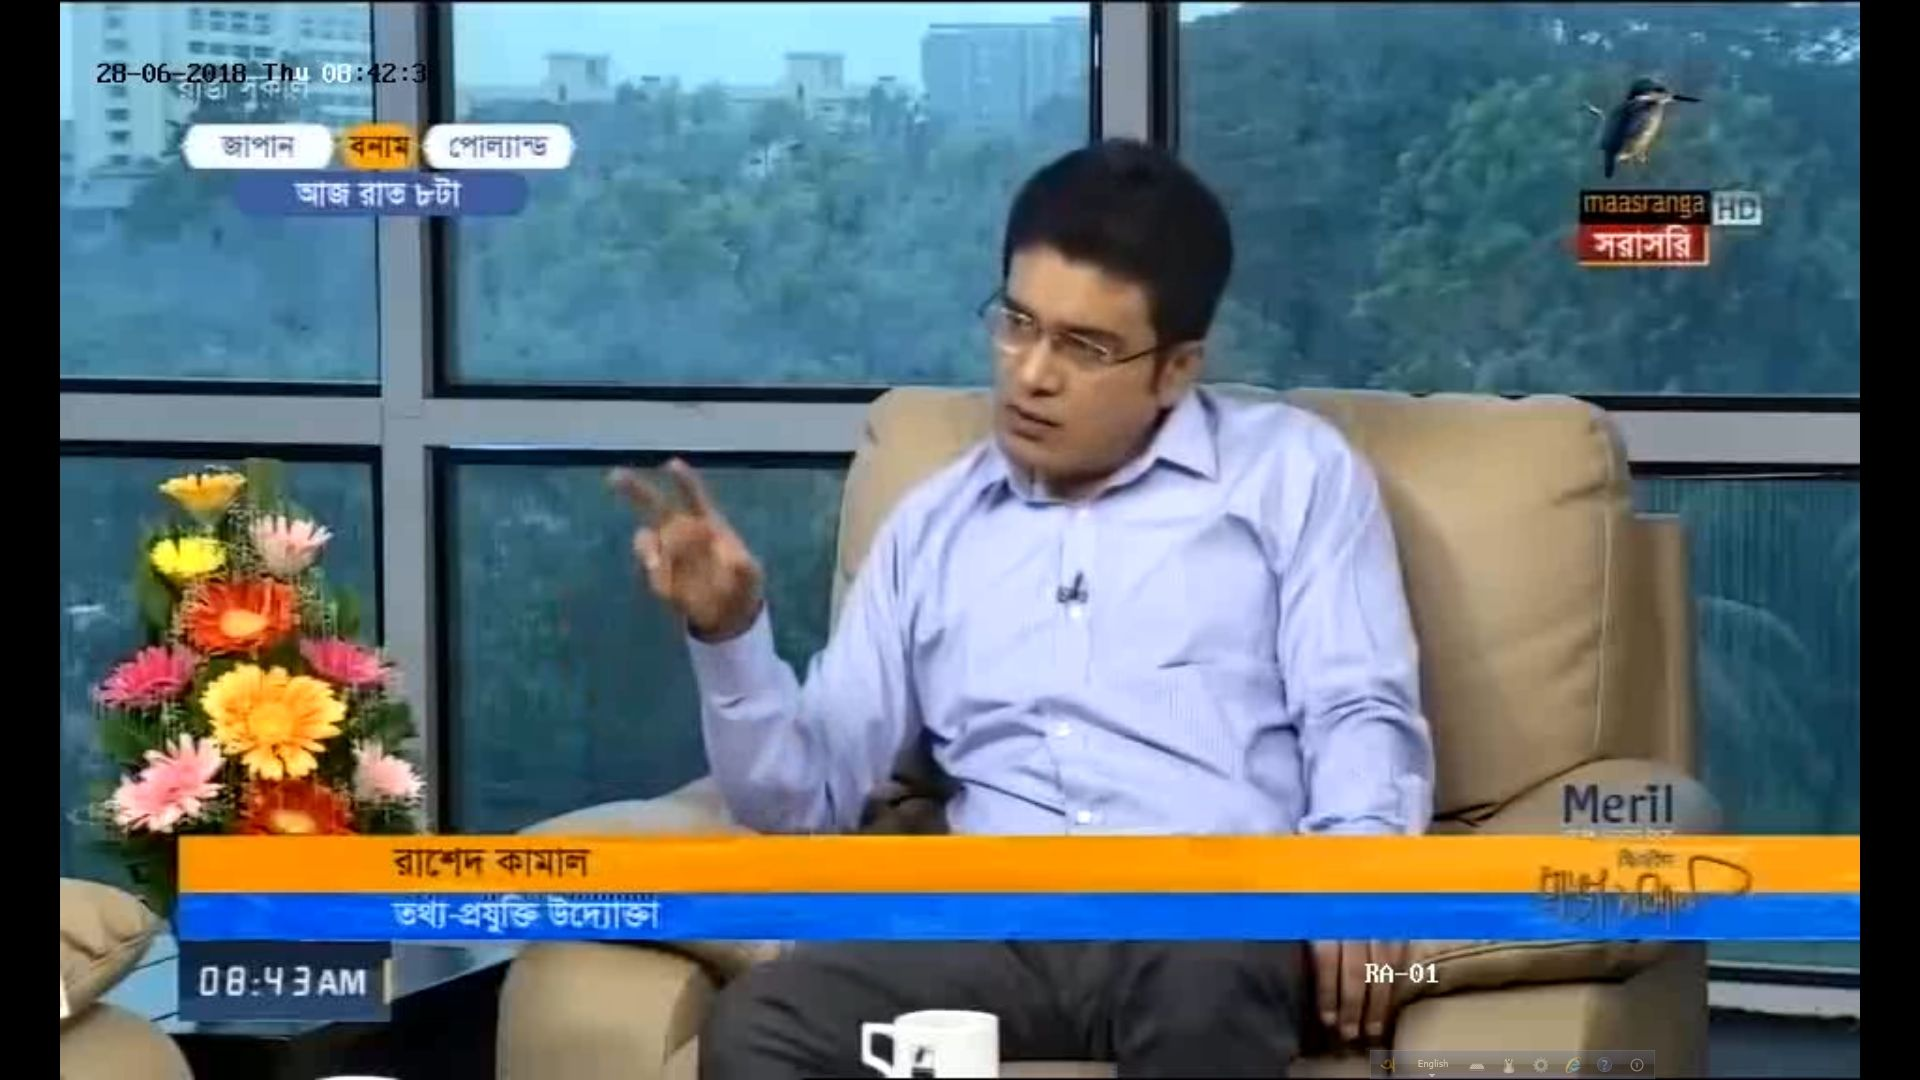 My interview by Maasranga TV on June 28, 2018